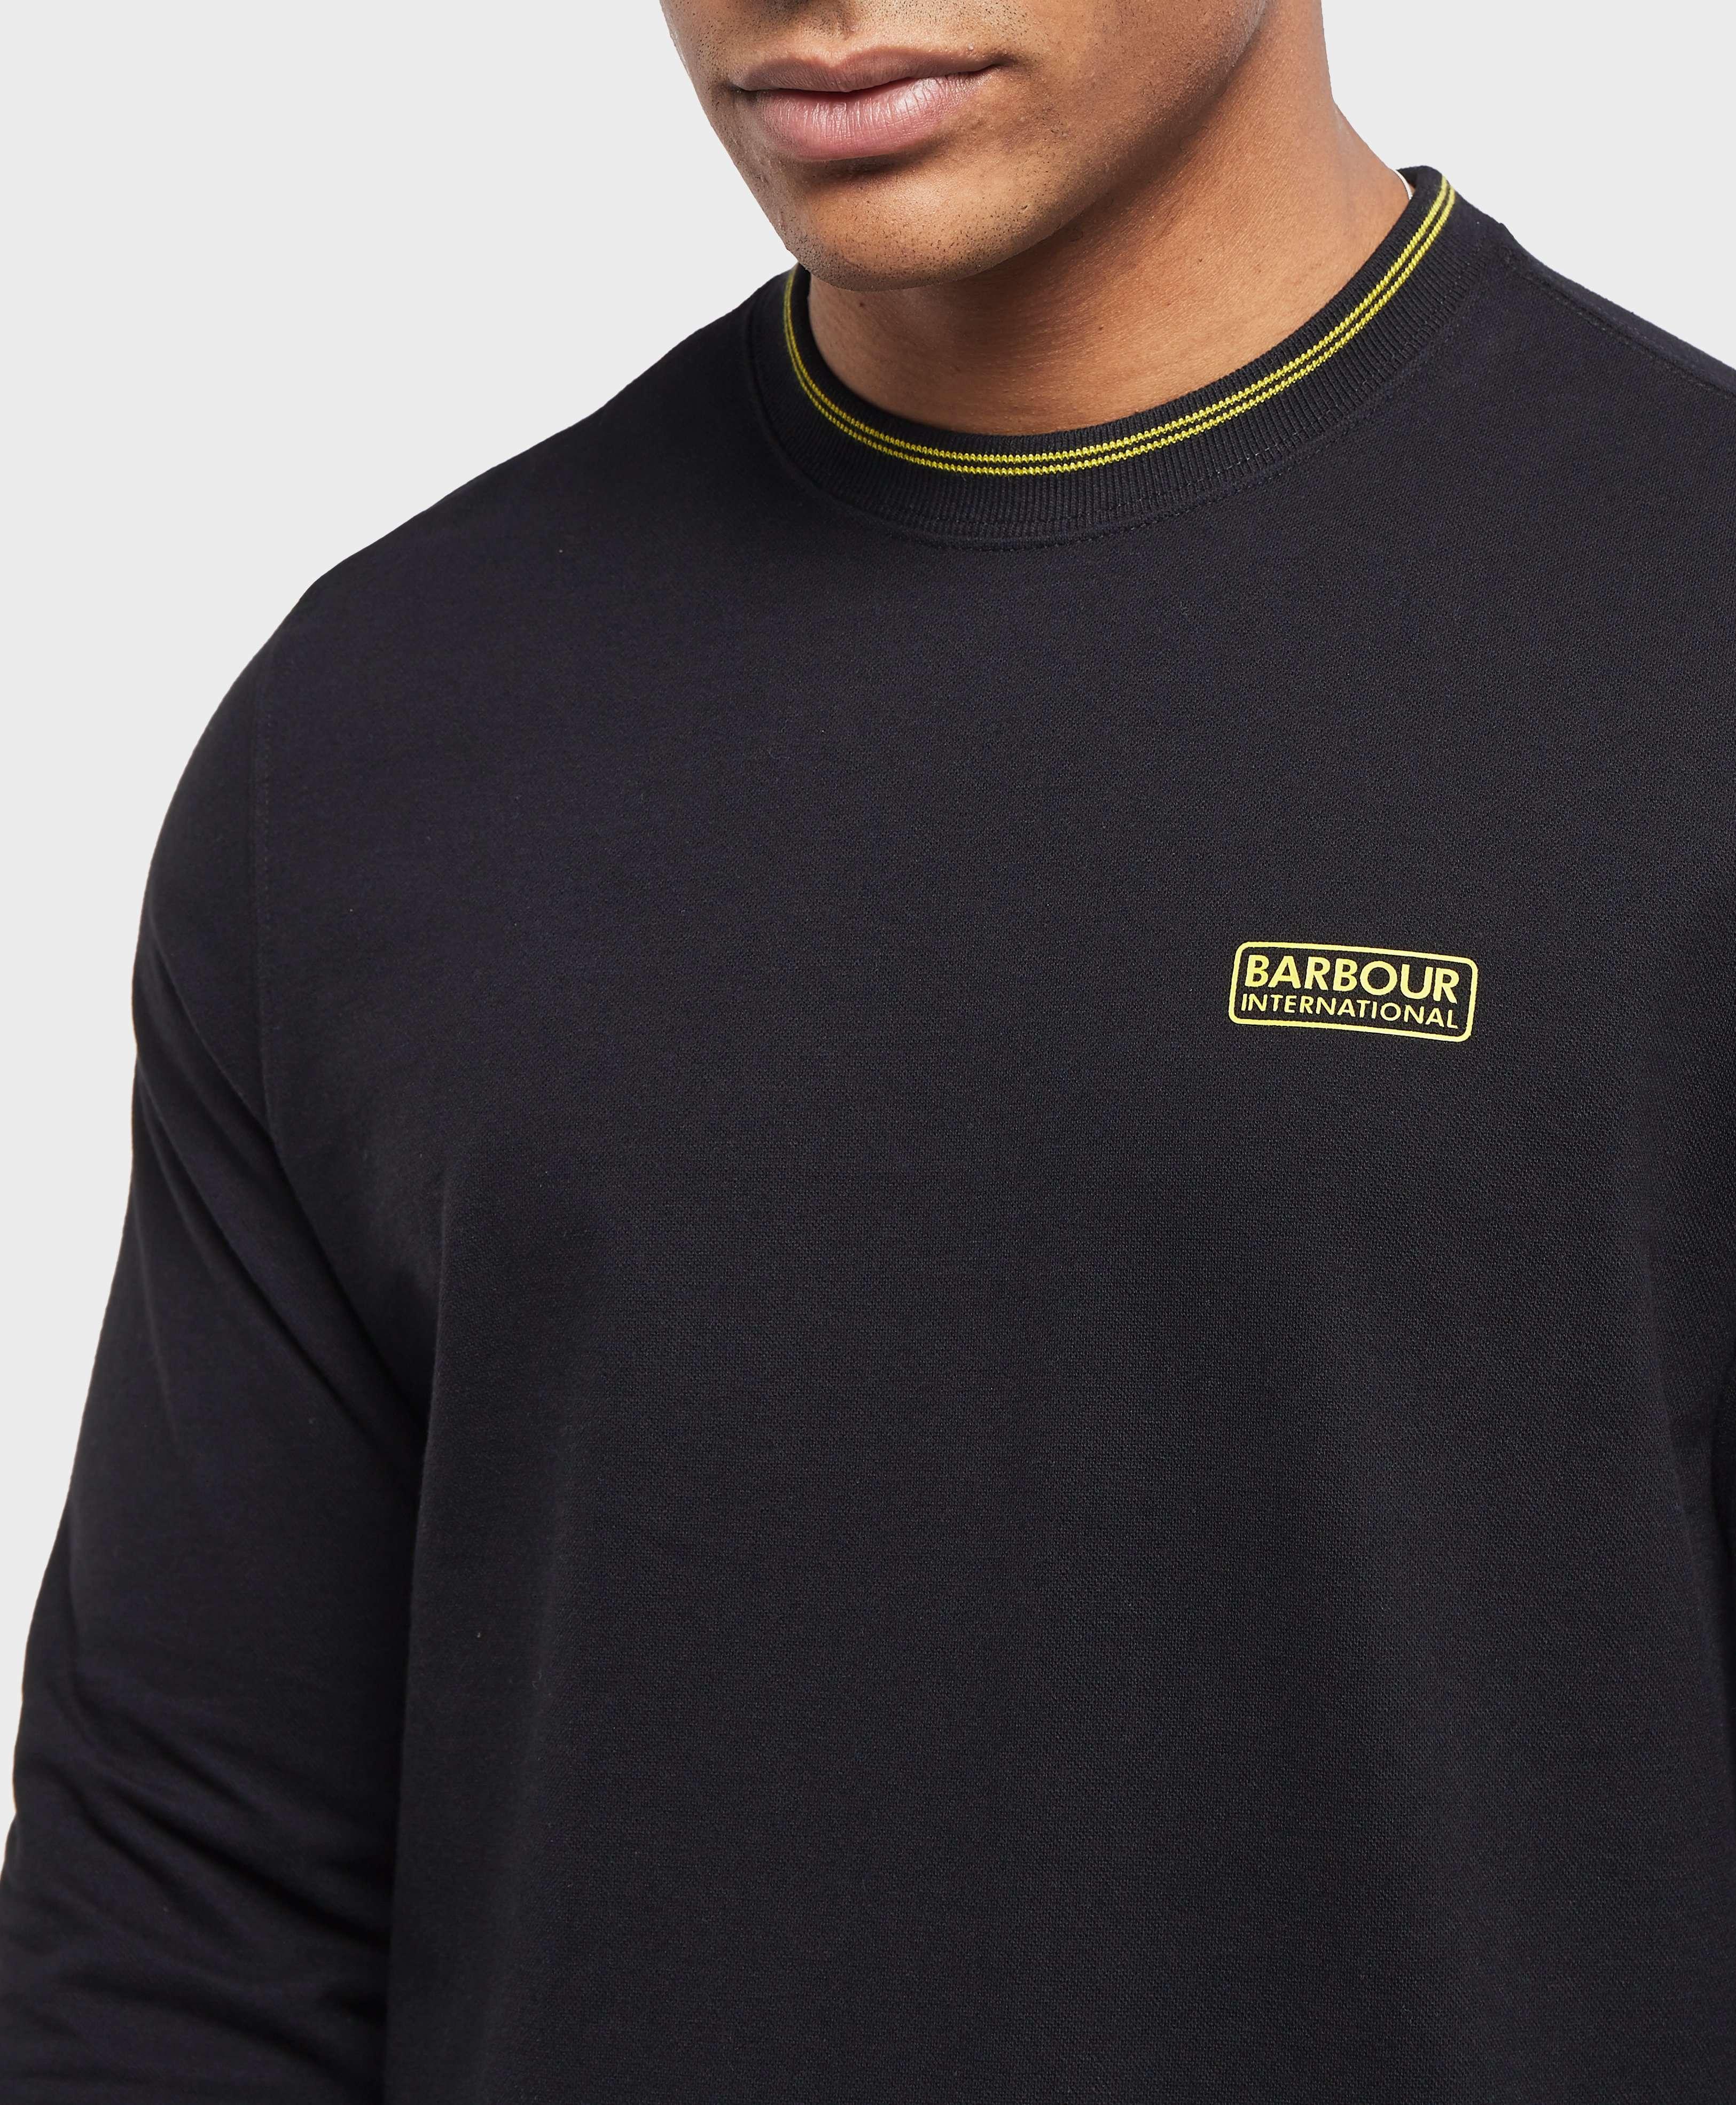 Barbour International Apex Long Sleeve T-Shirt